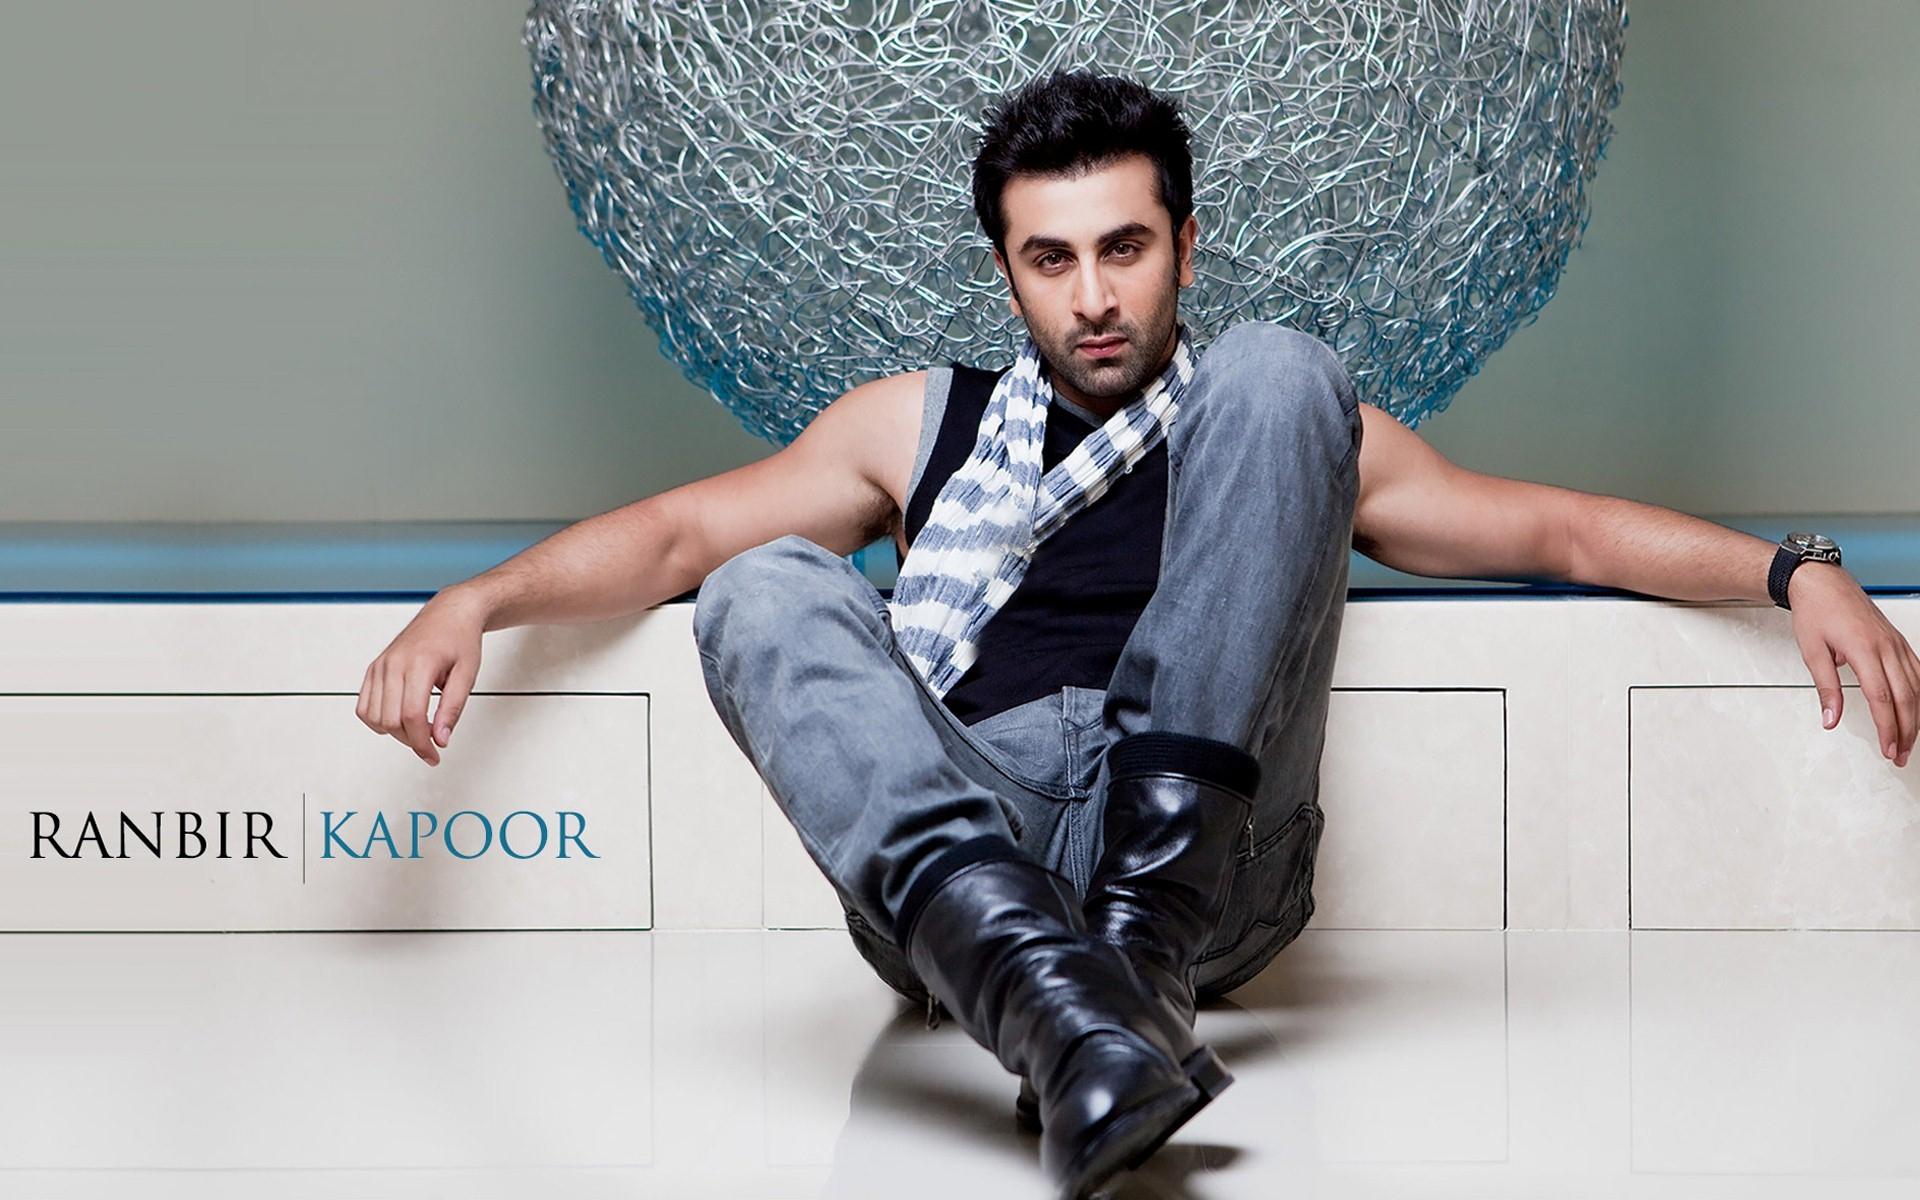 Ranbir Kapoor Hd